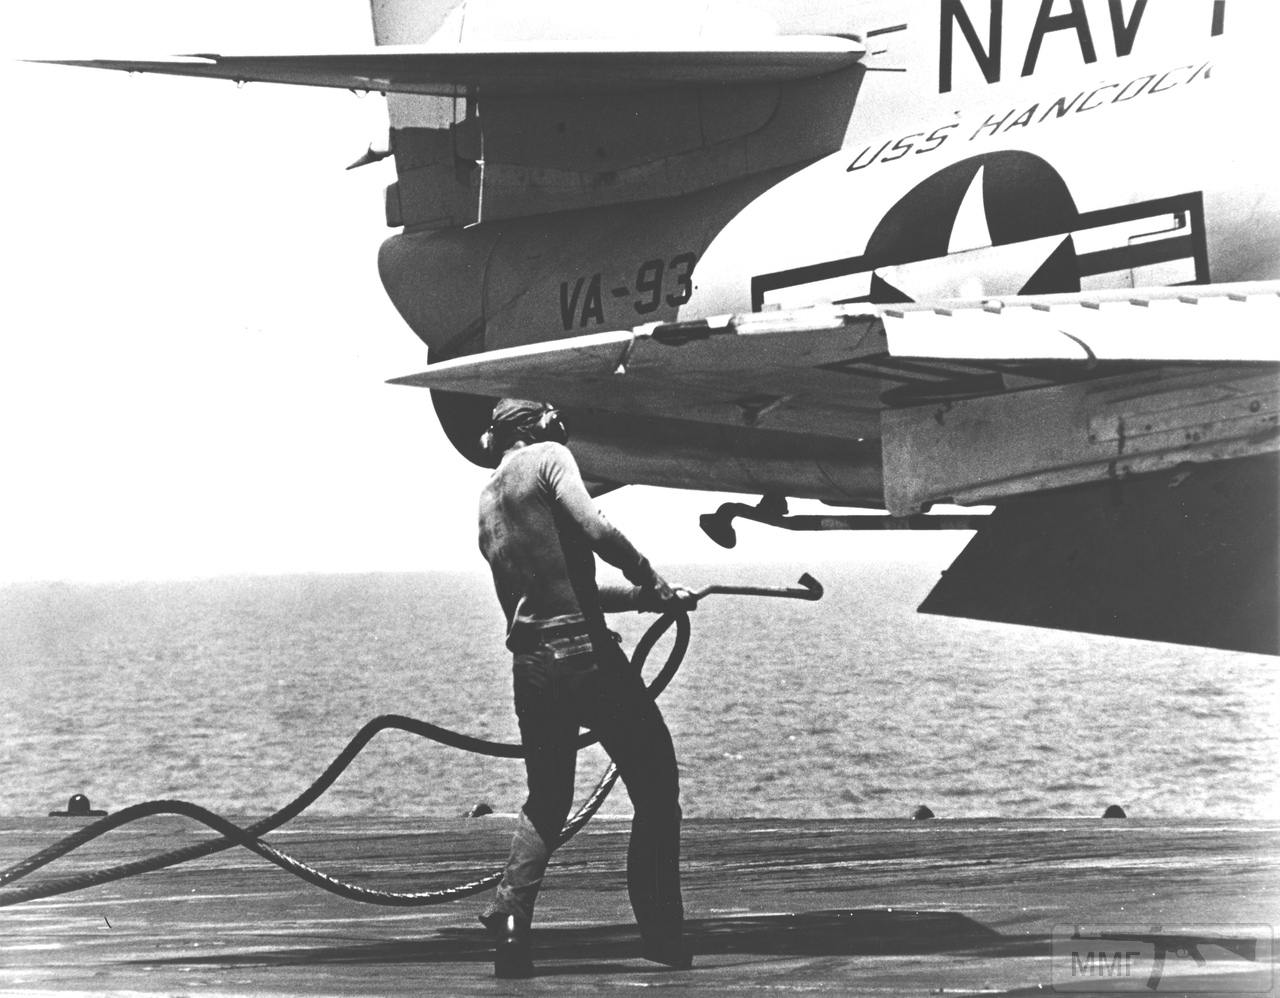 41613 - Бомбардировки Северного Вьетнама